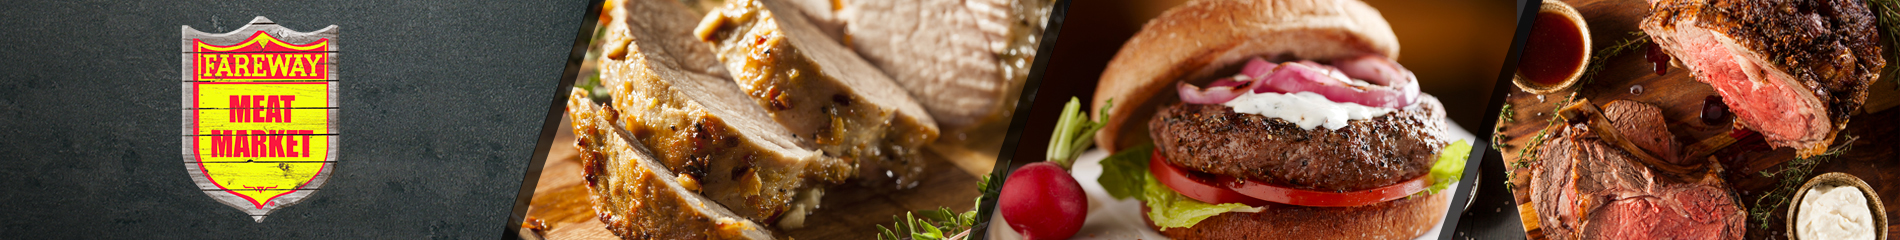 Fareway Meat Market Shop Meat Specials Bundles Fareway